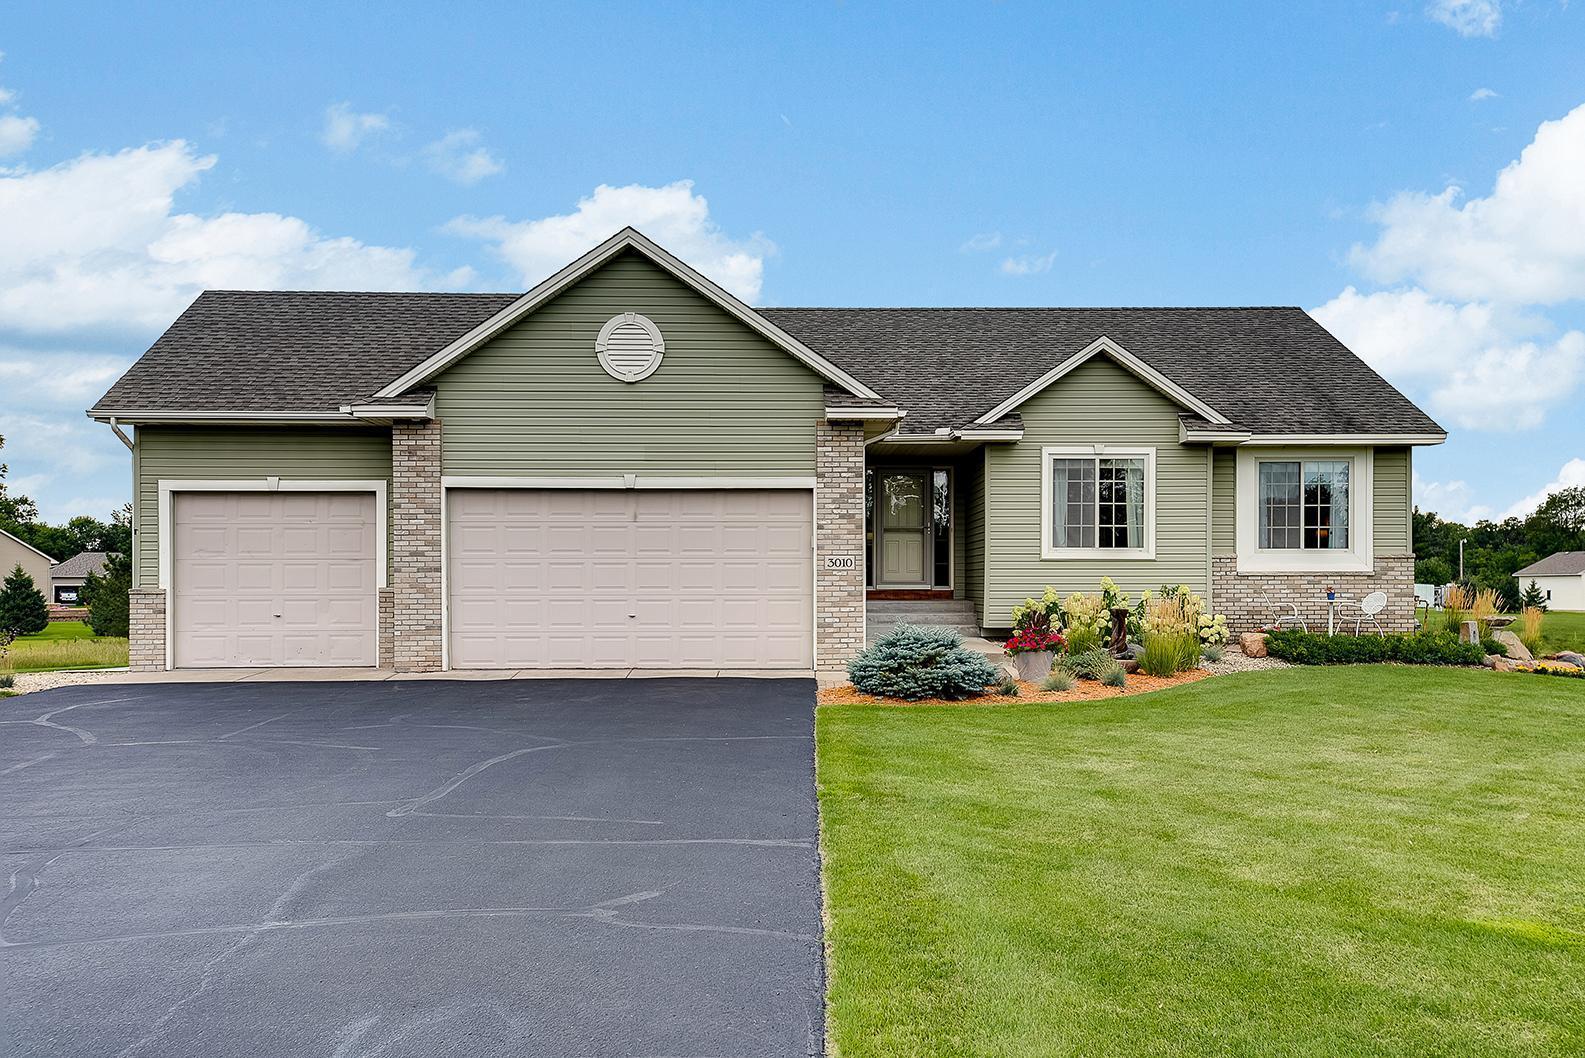 3010 209th Lane NW Property Photo - Oak Grove, MN real estate listing